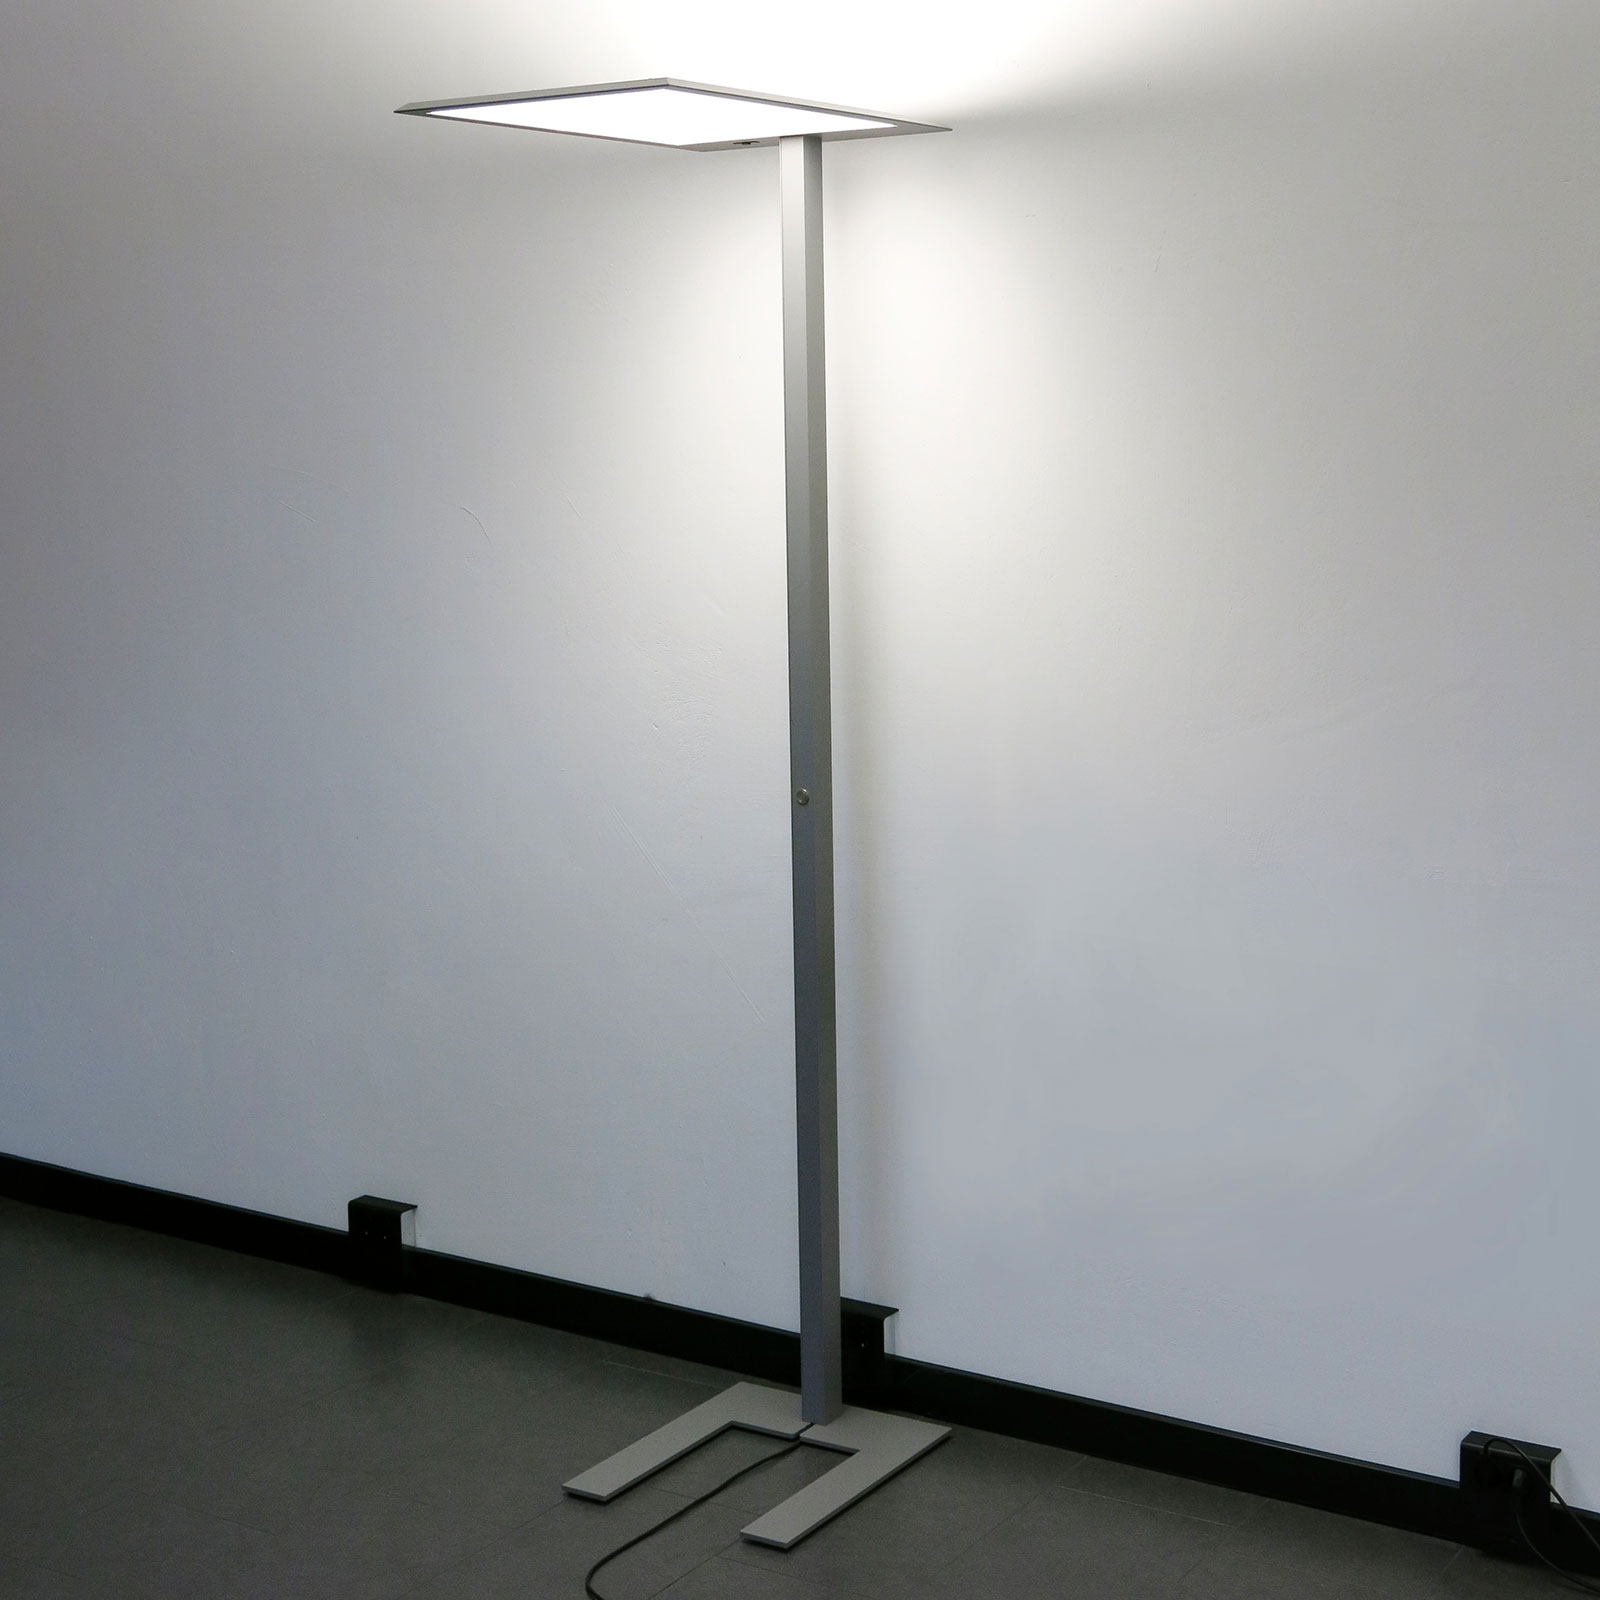 LED-lattiavalo LEAS, 203 cm, titaani, tunnistin